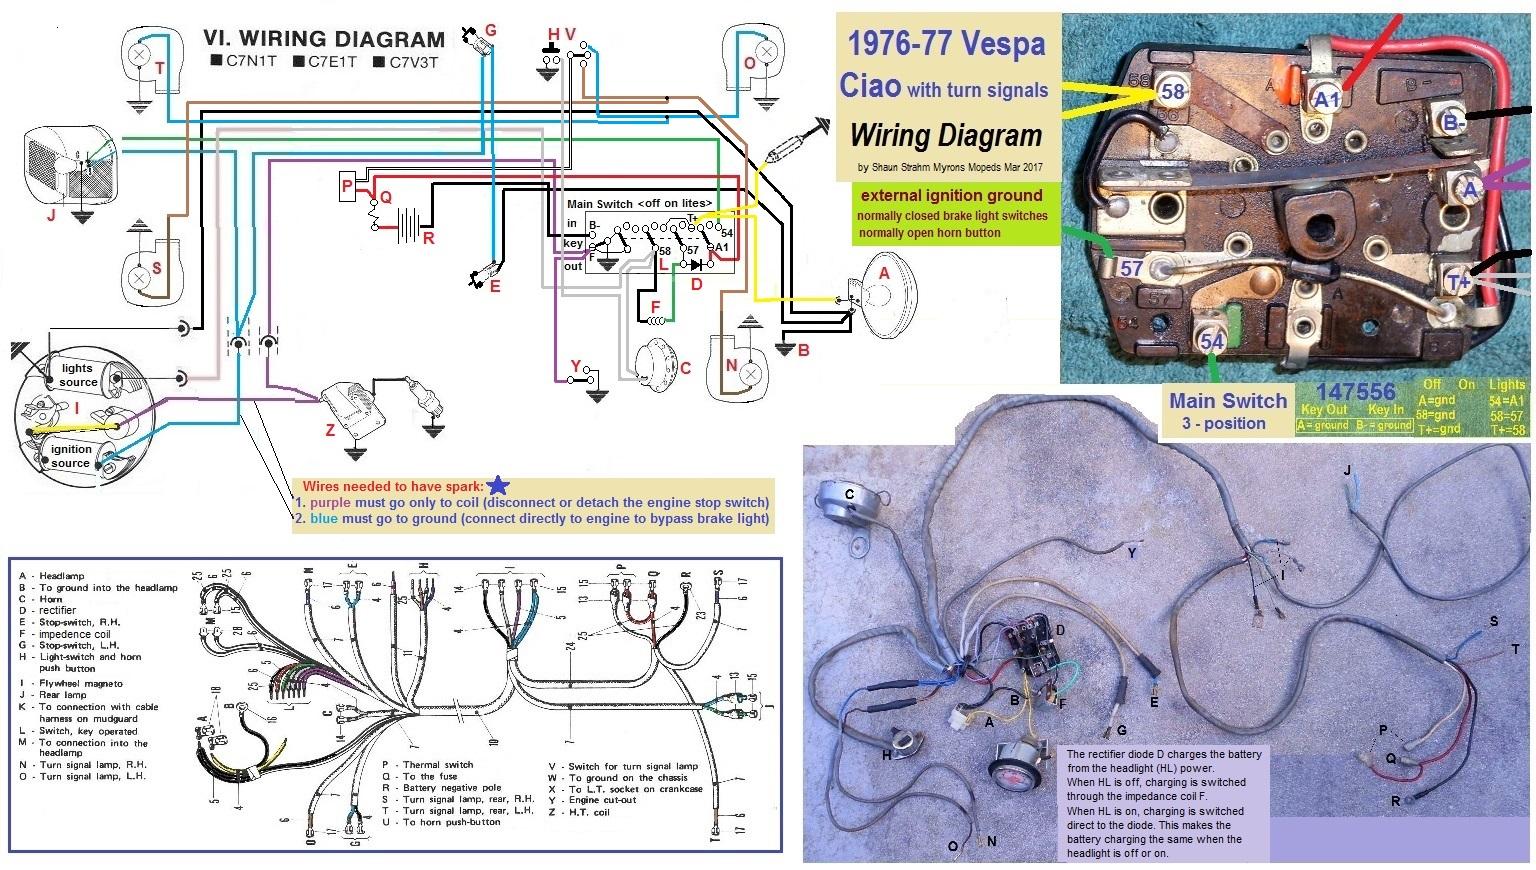 hight resolution of 1977 sachs moped wiring diagram royal ryder wiring diagram